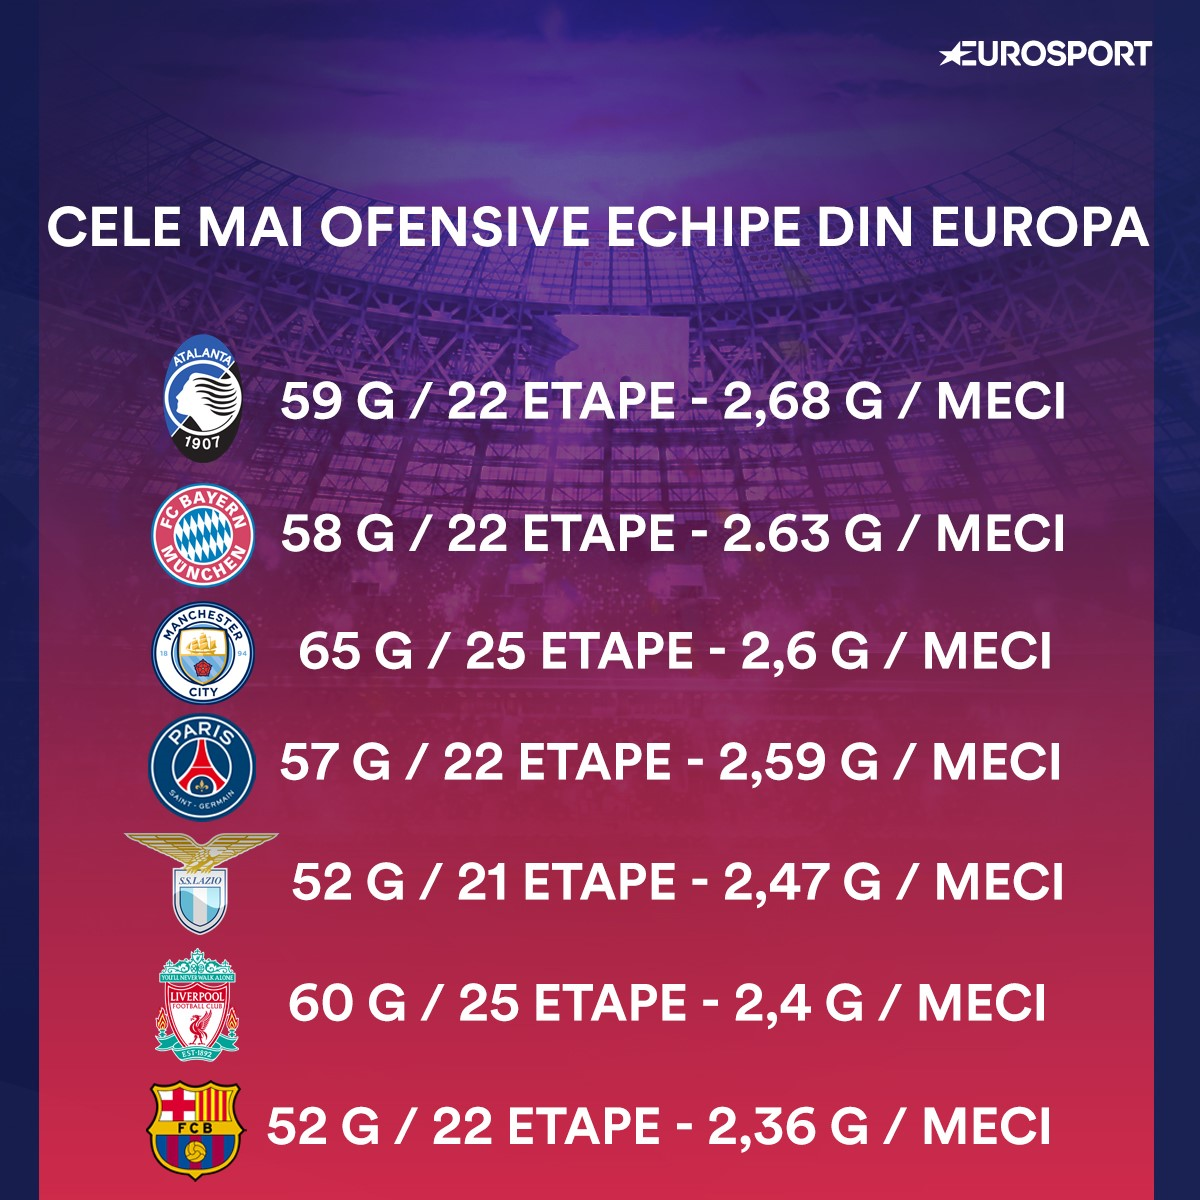 https://i.eurosport.com/2020/02/04/2769012.jpg